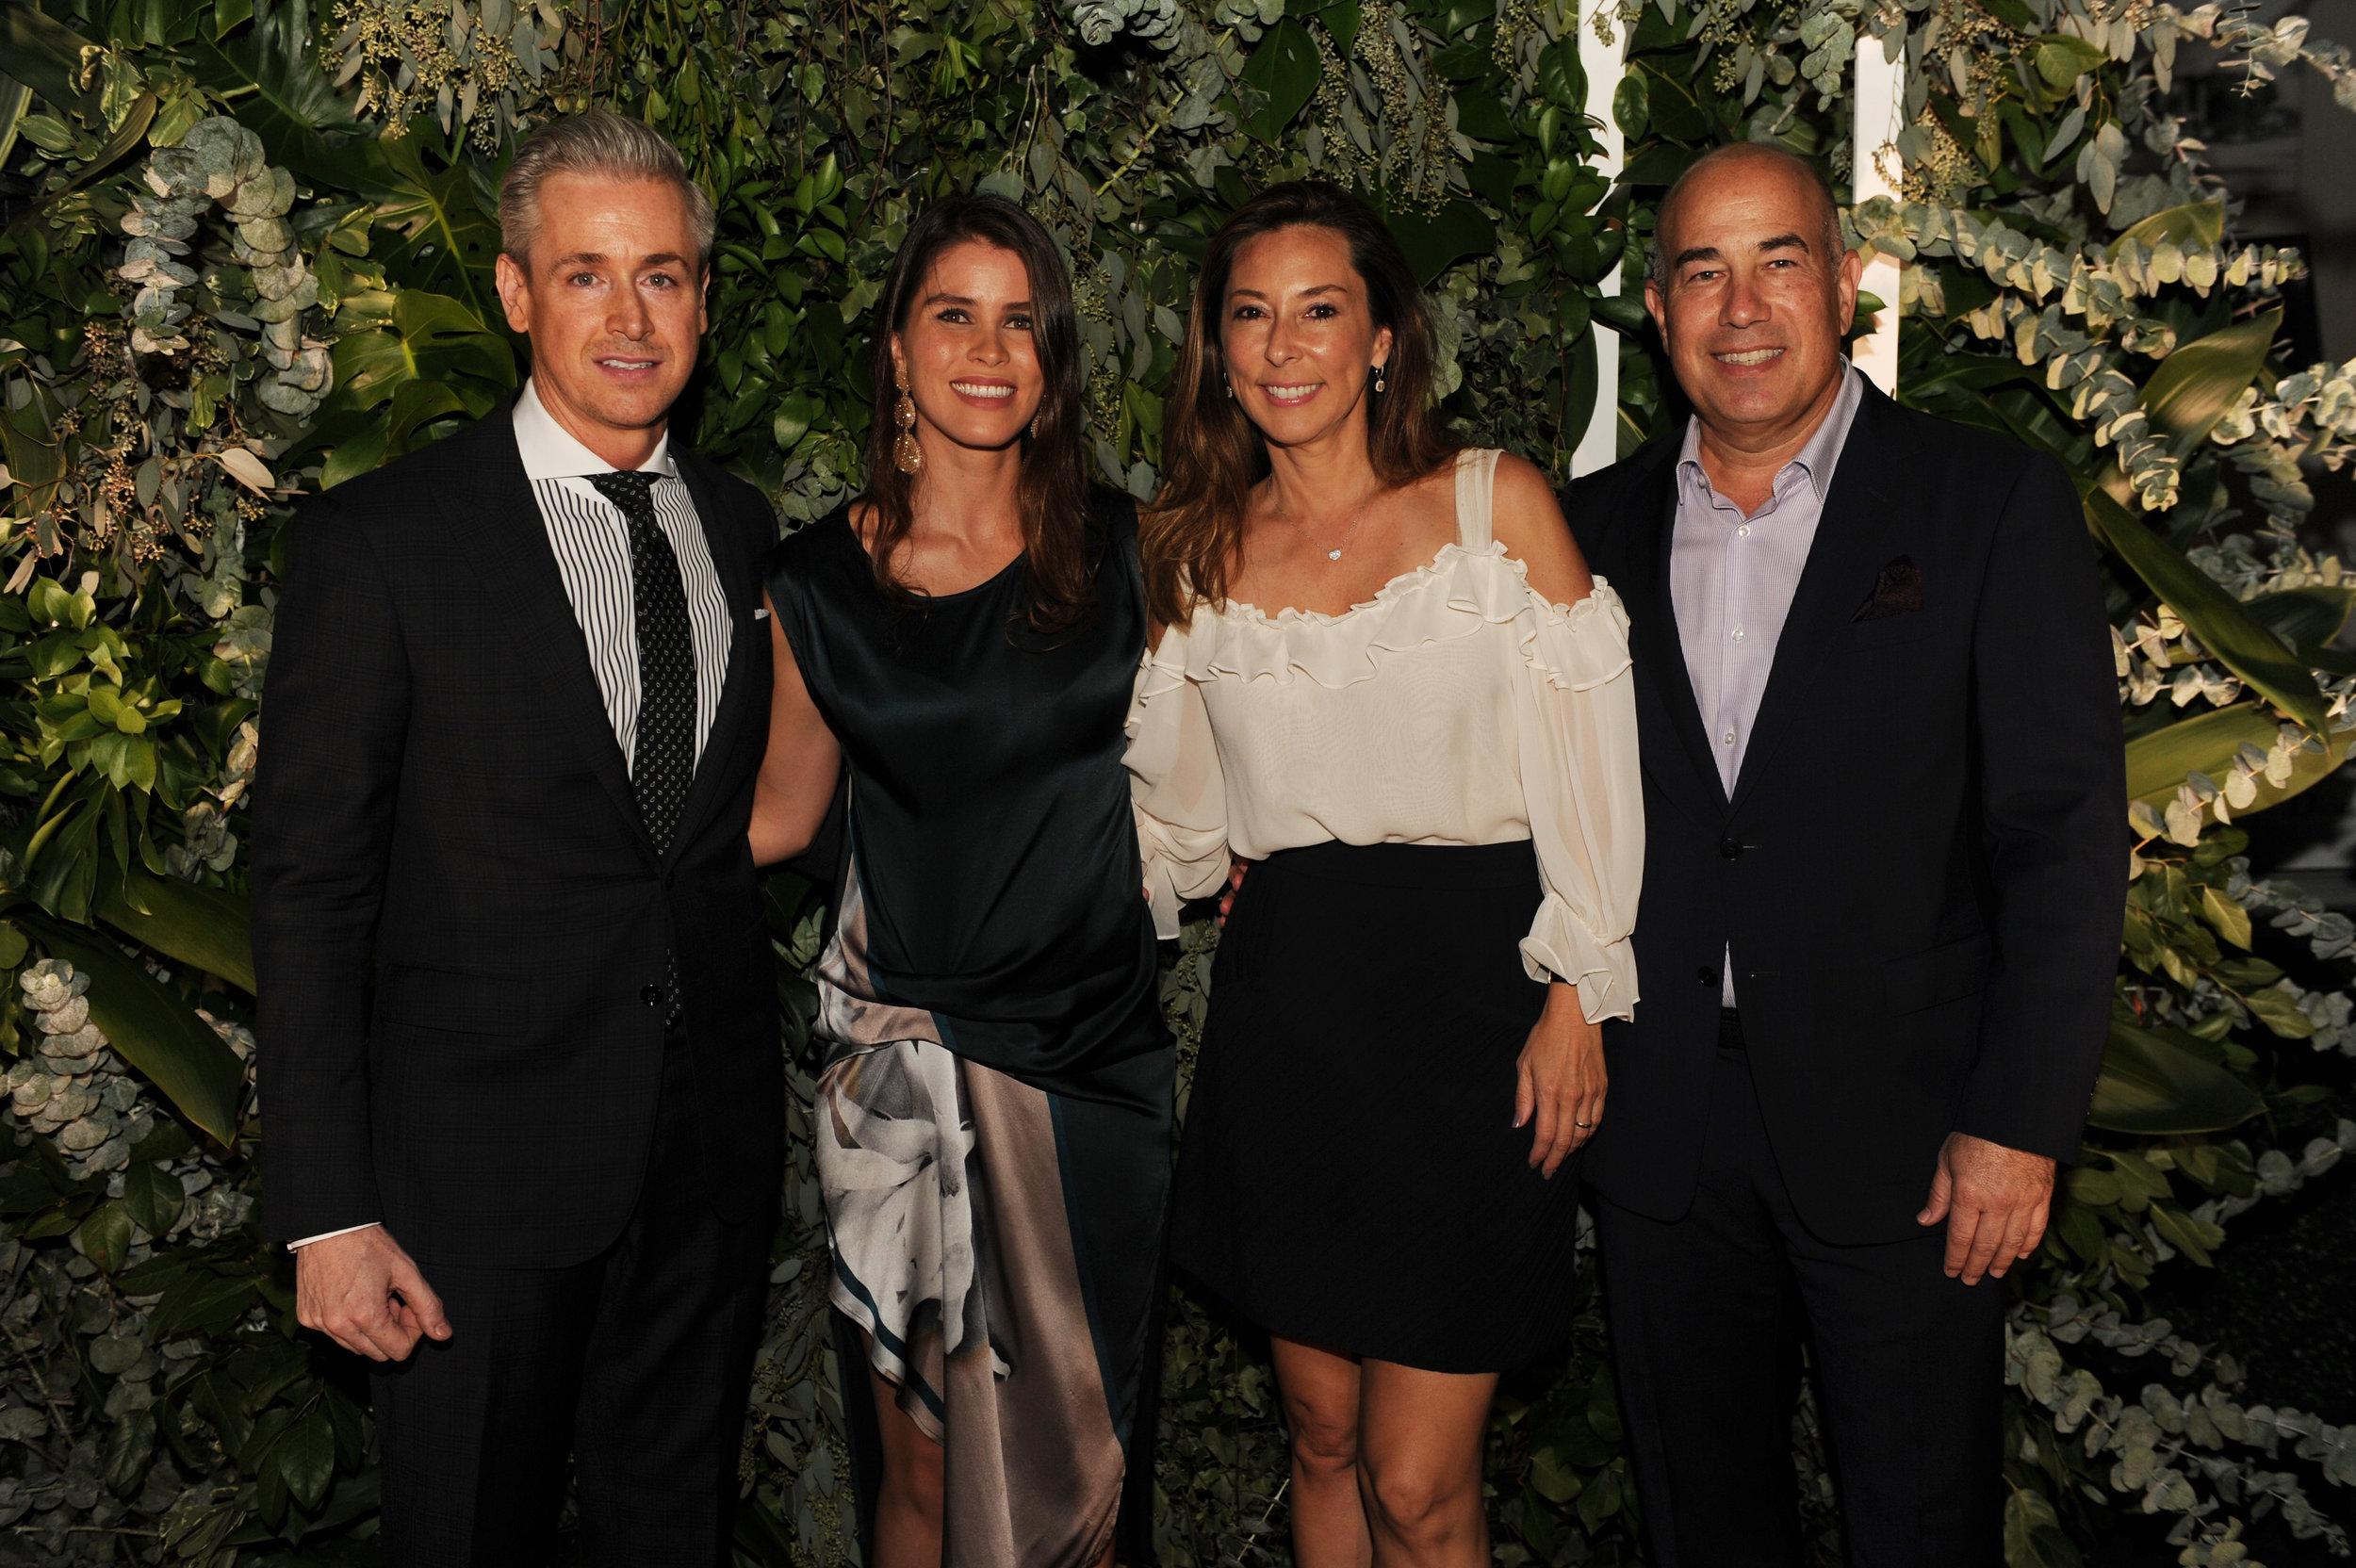 Christopher Jude, Mariana Garcia, Ivonn Goihman, & Richard Goihman